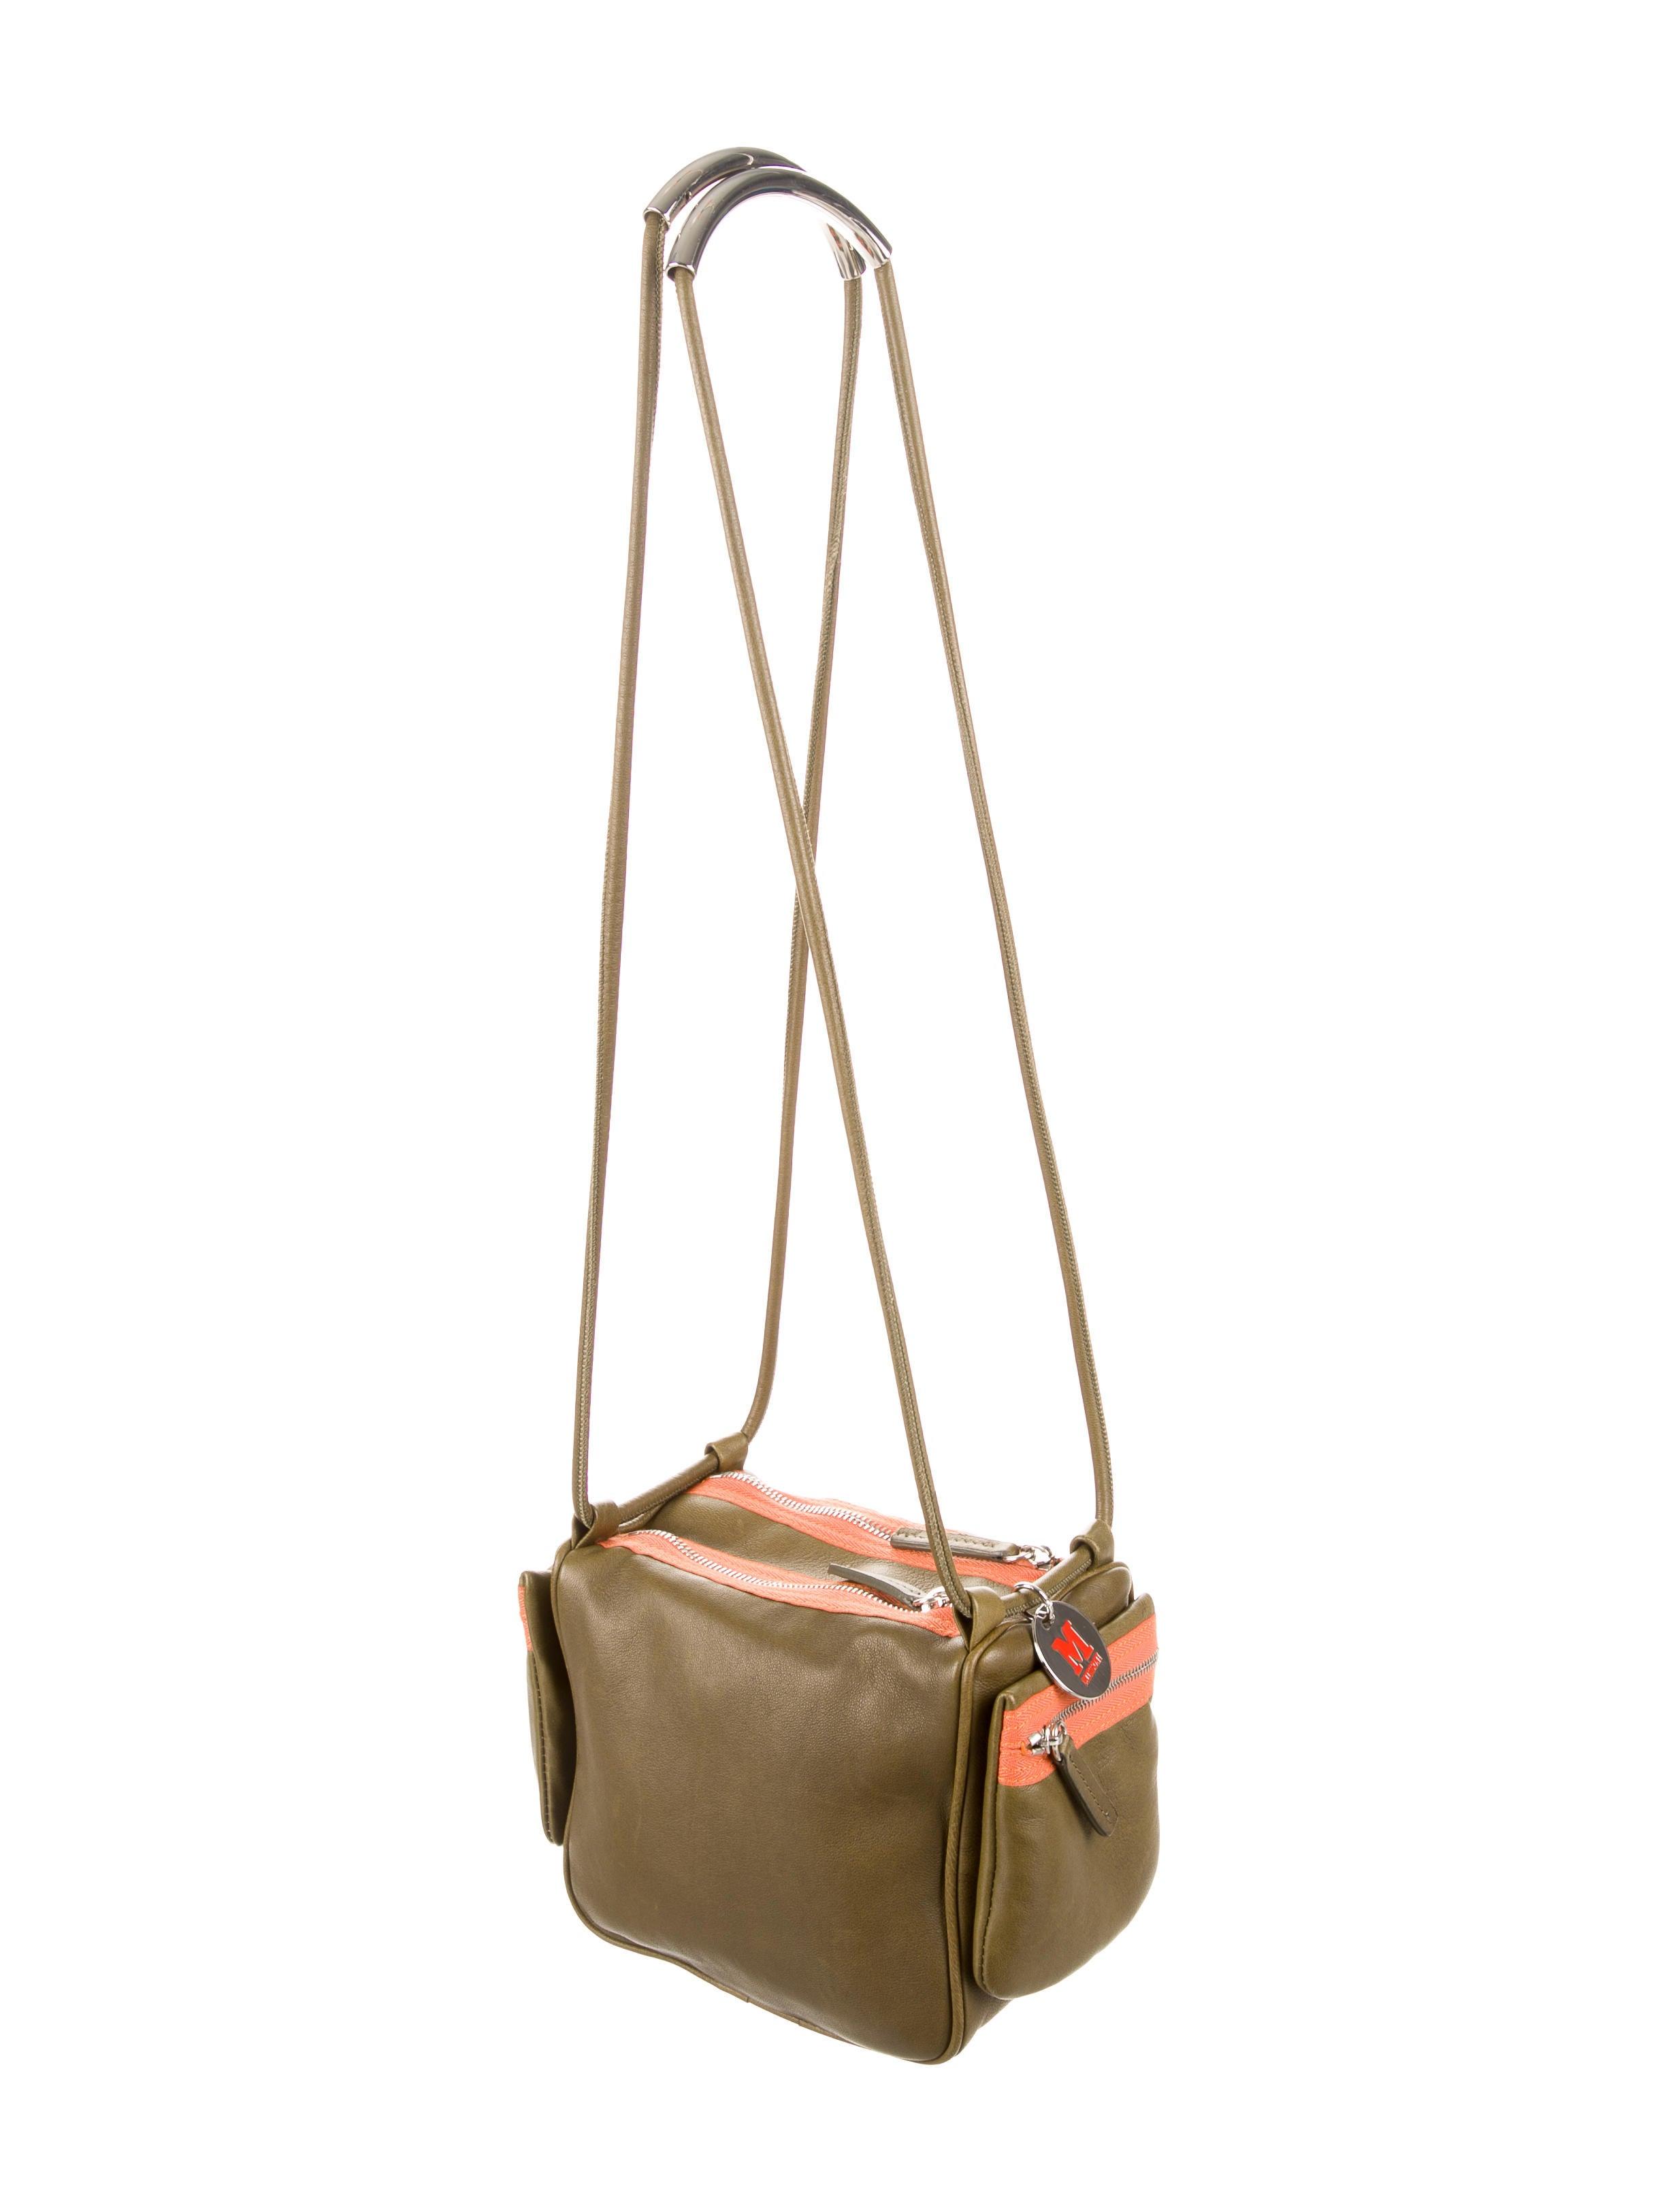 M Missoni Leather Shoulder Bag - Handbags